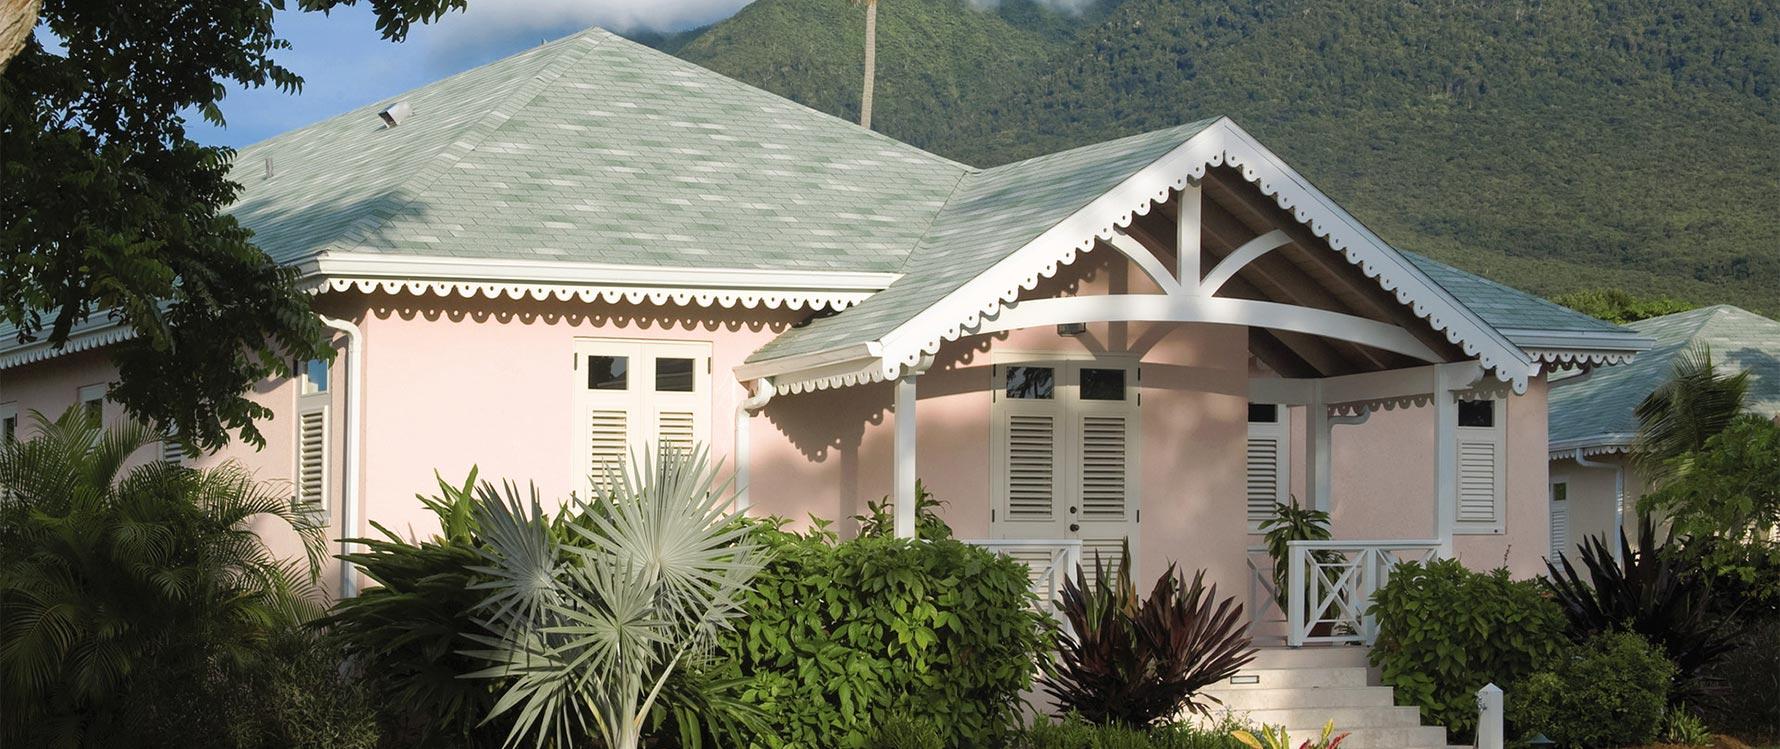 Entry with Nevis Peak